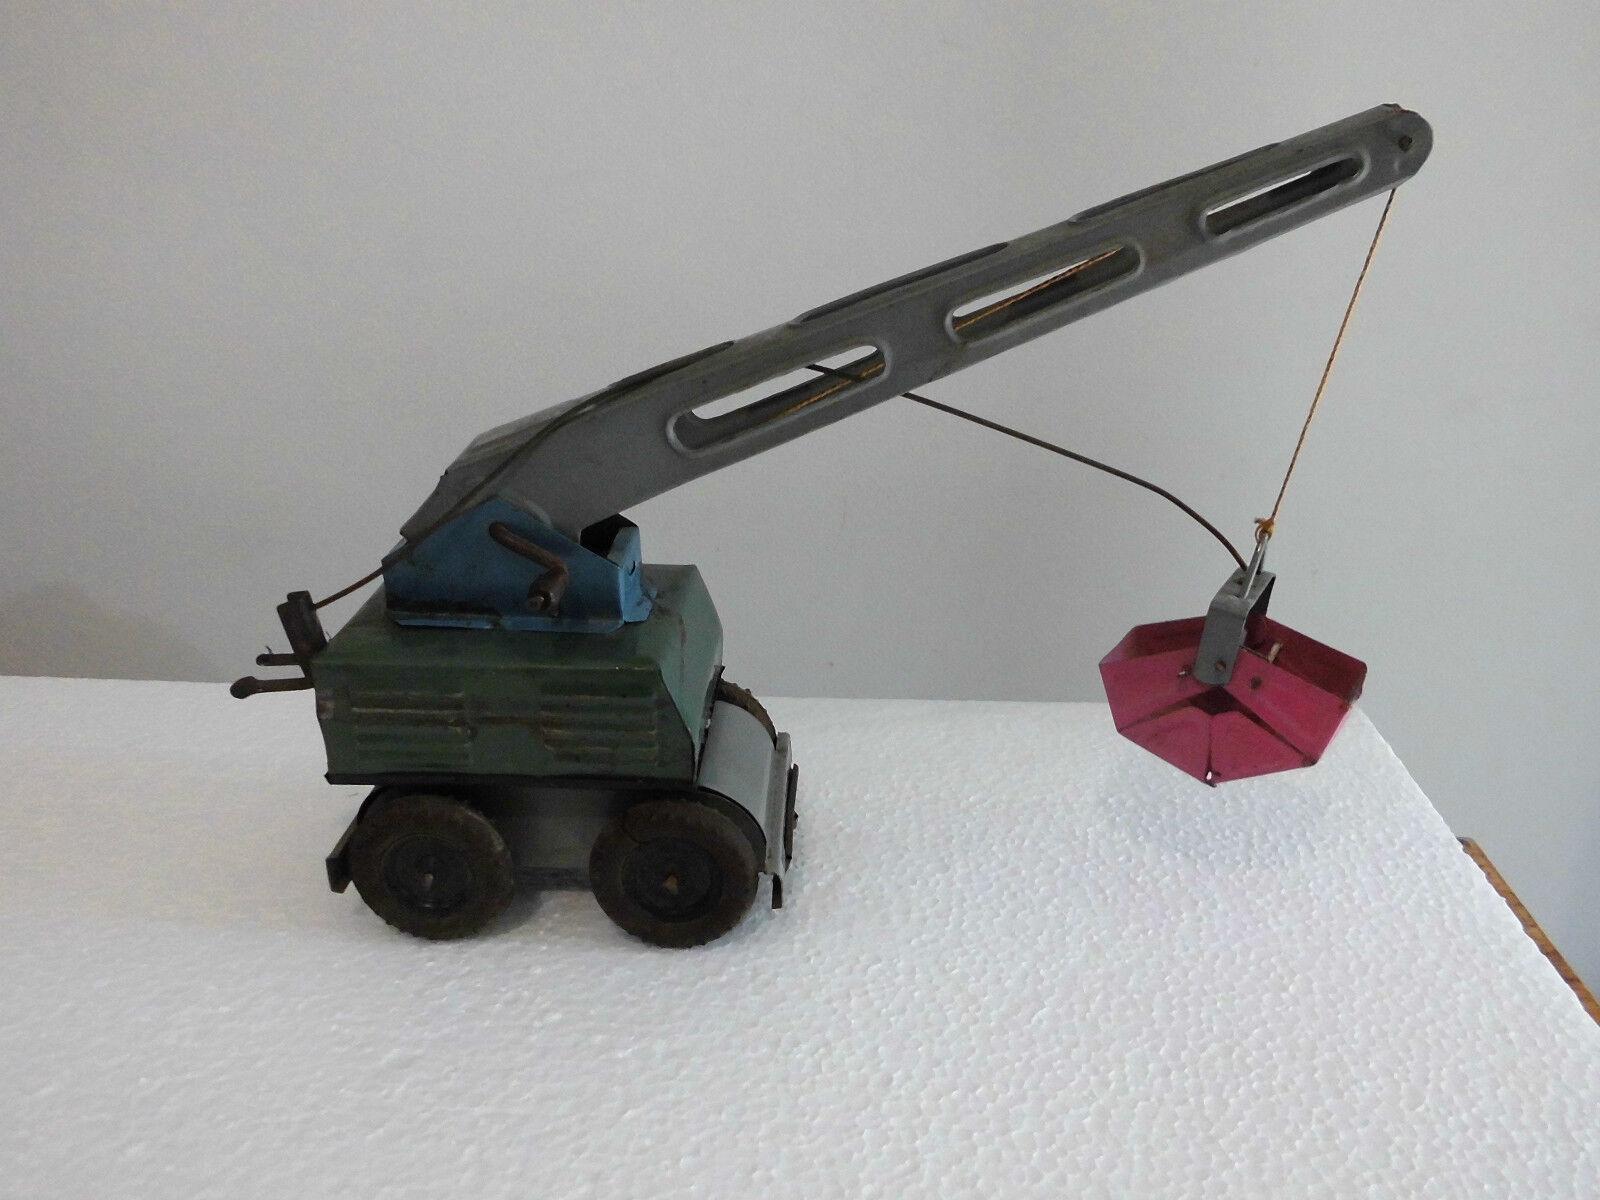 Rare Vintage Tin Toy Excavator  Tpk Metalik-Razgrad  Made in Bulgaria 1950s